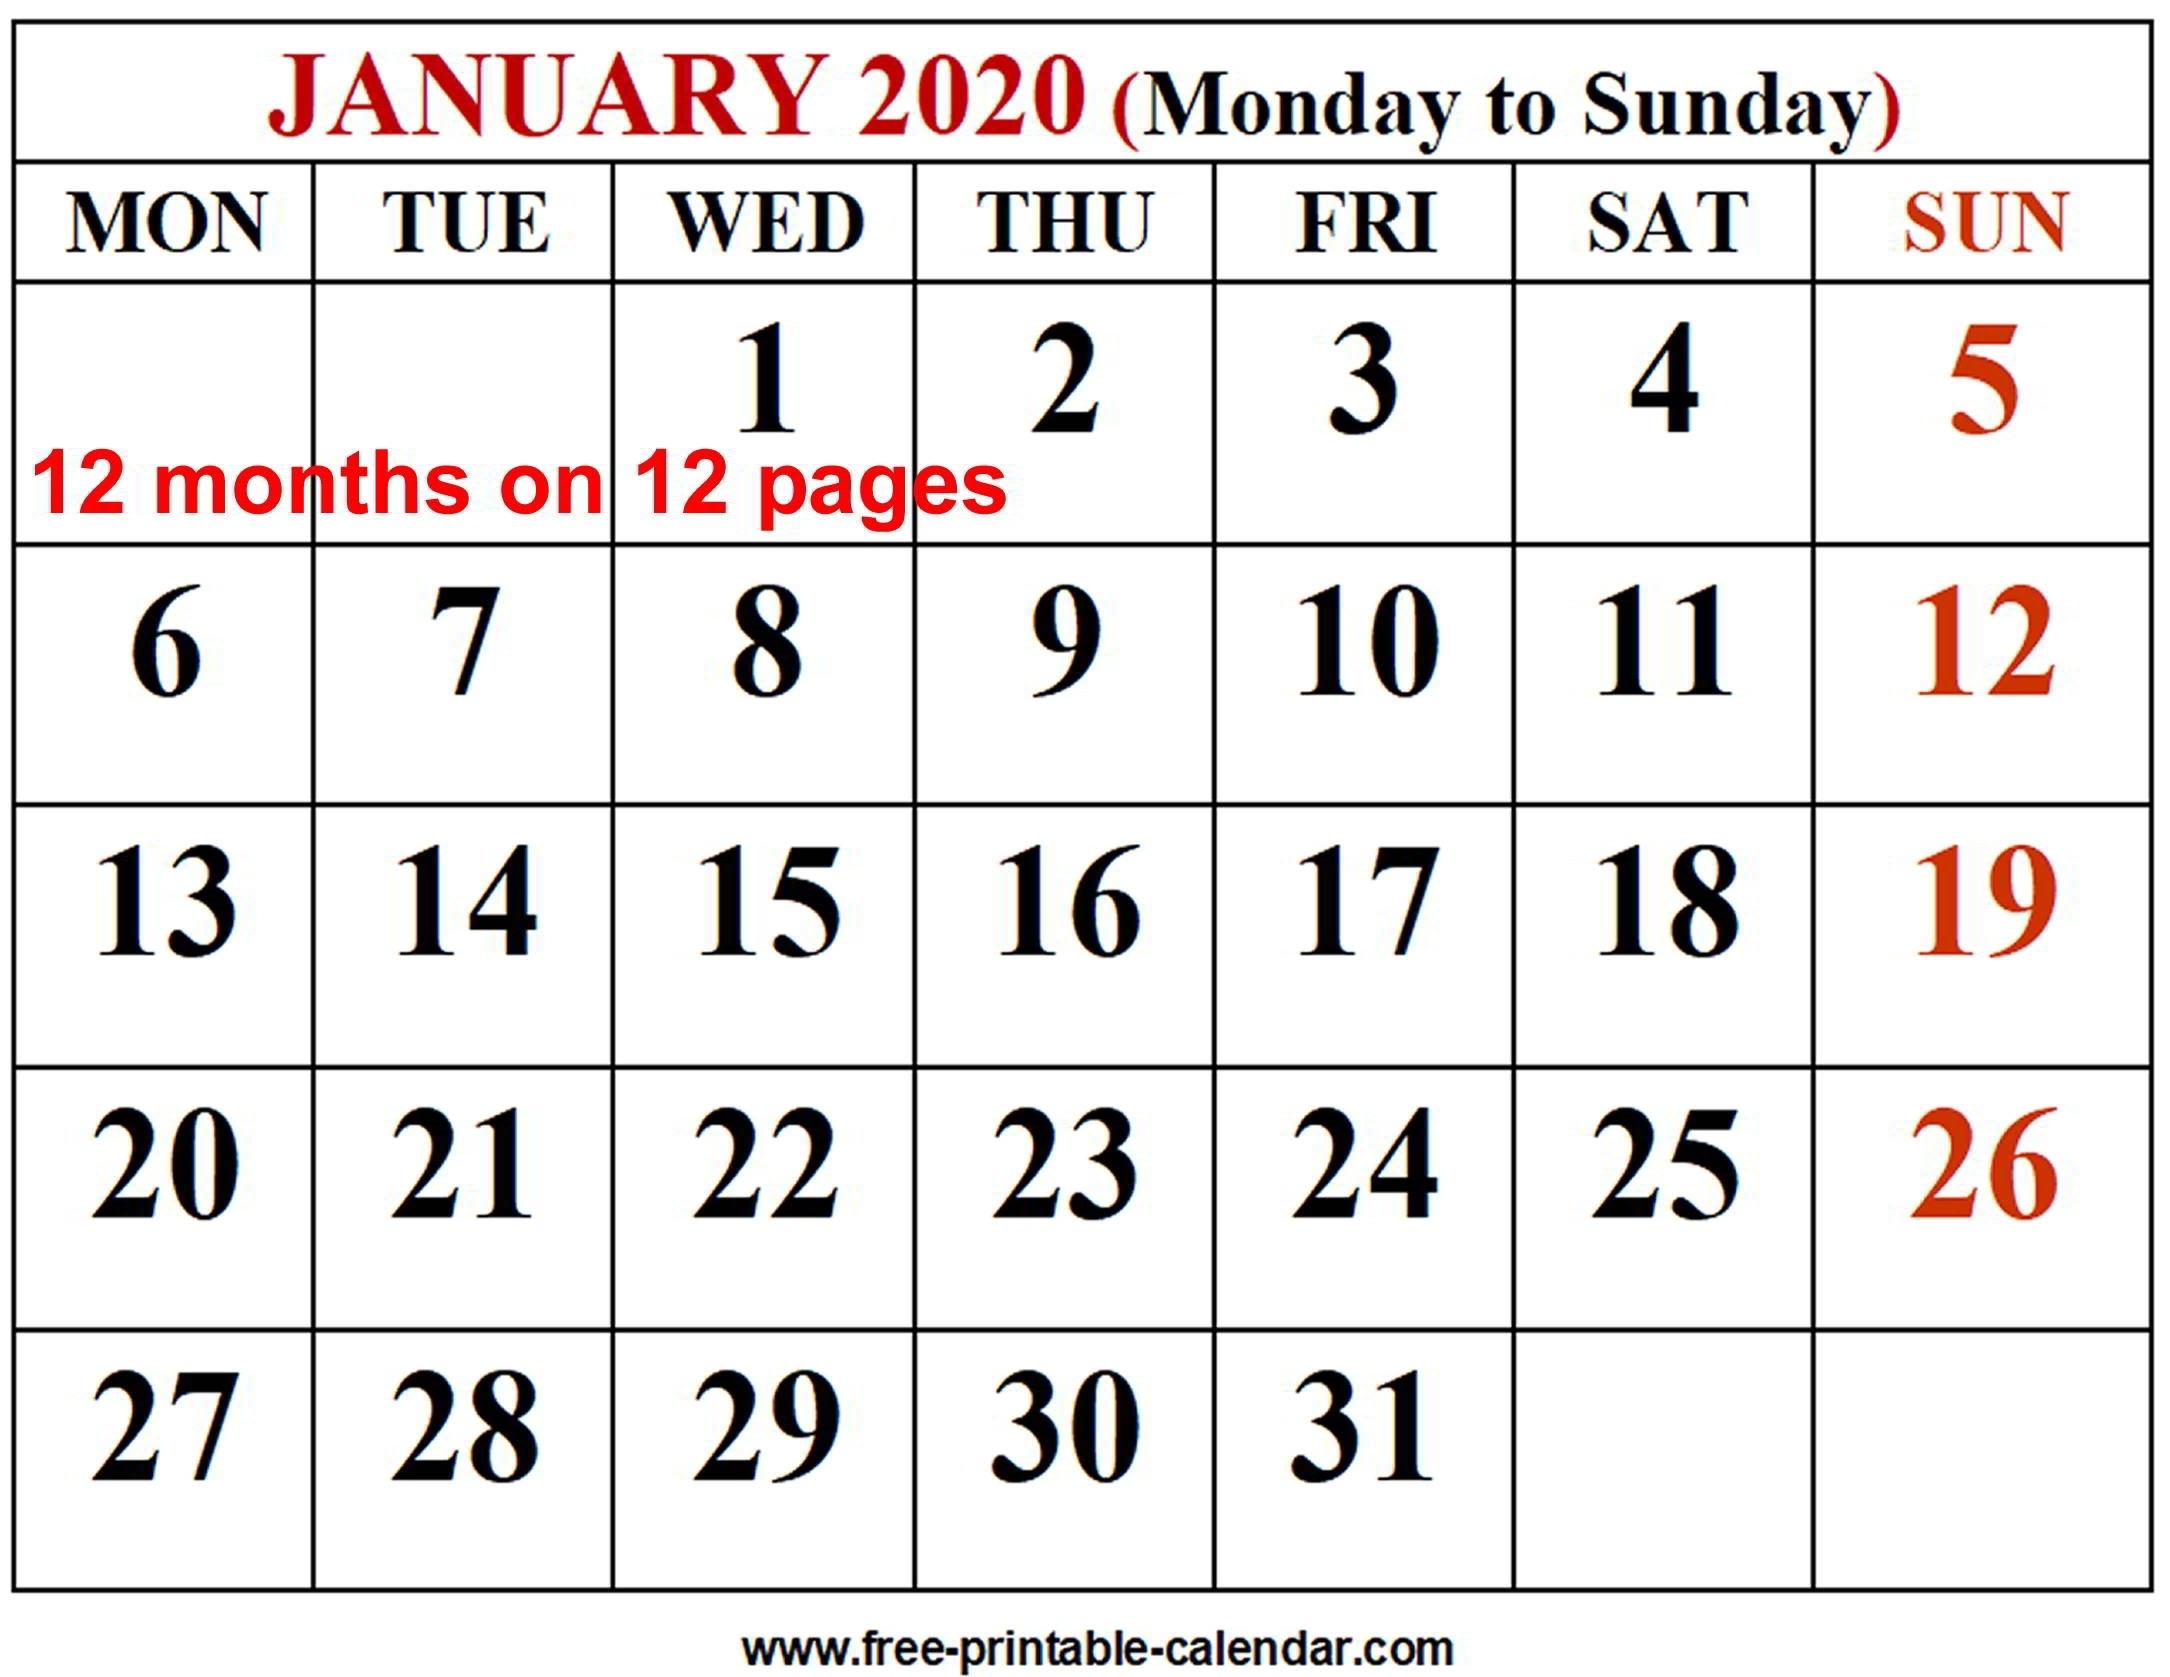 2020 Calendar Template - Free-Printable-Calendar  Free Printable Month Calendar